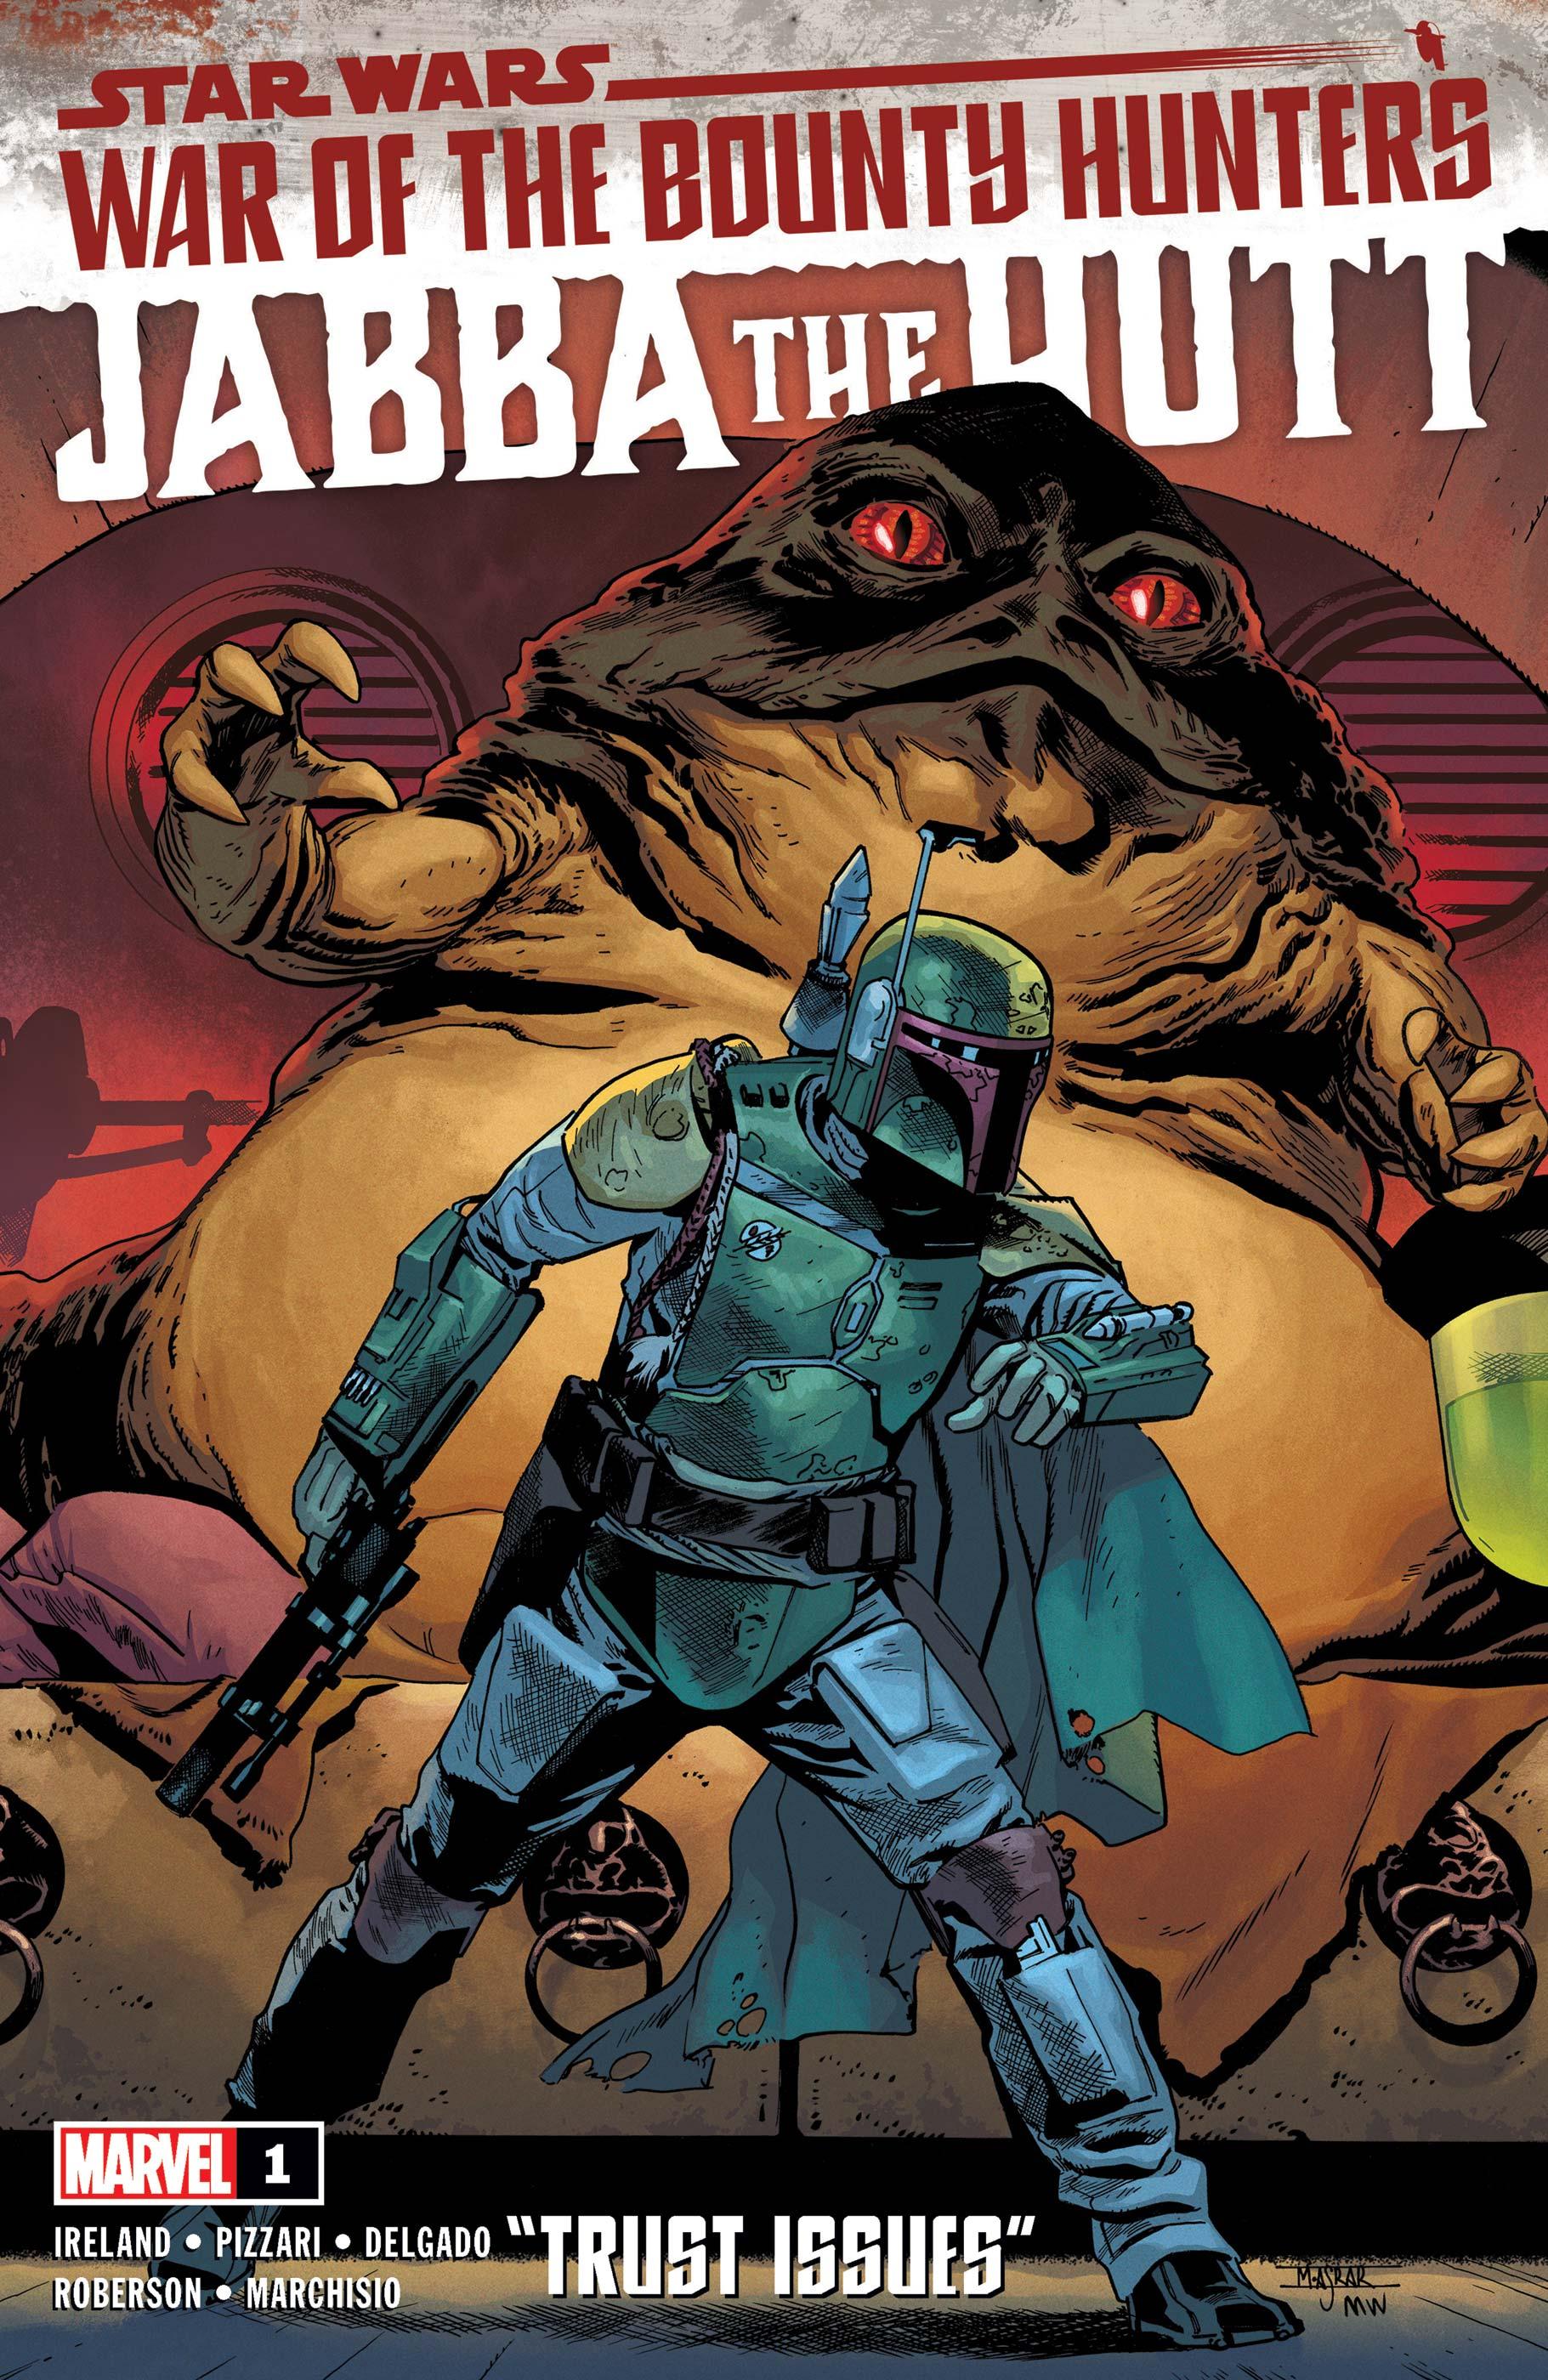 Star Wars: War of the Bounty Hunters - Jabba the Hutt (2021) #1